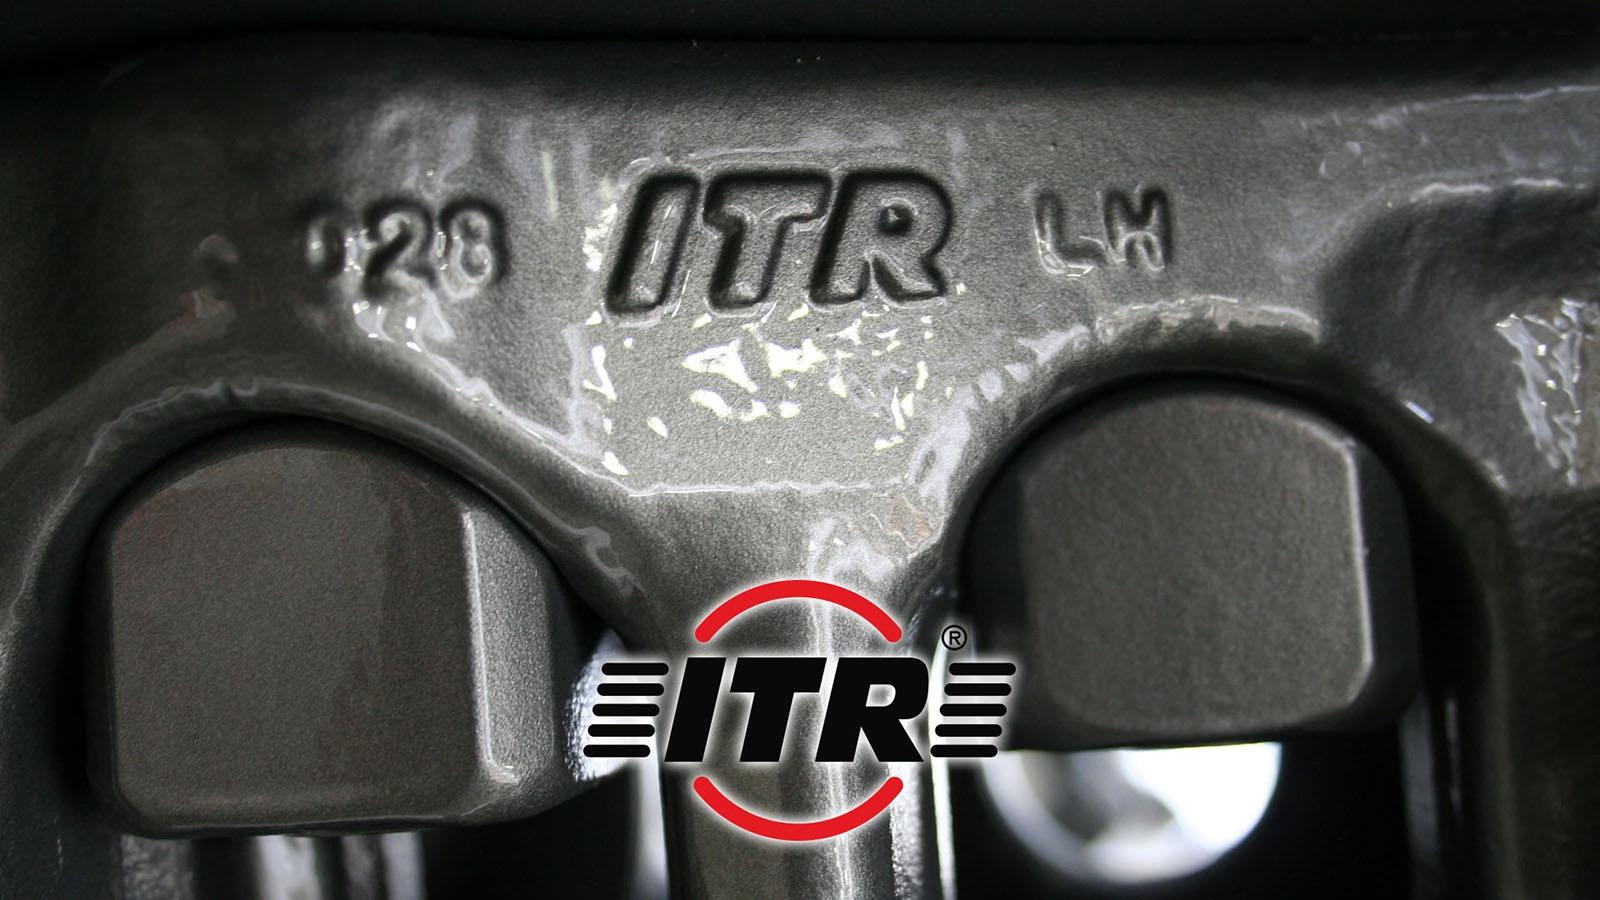 ITR_UC_20